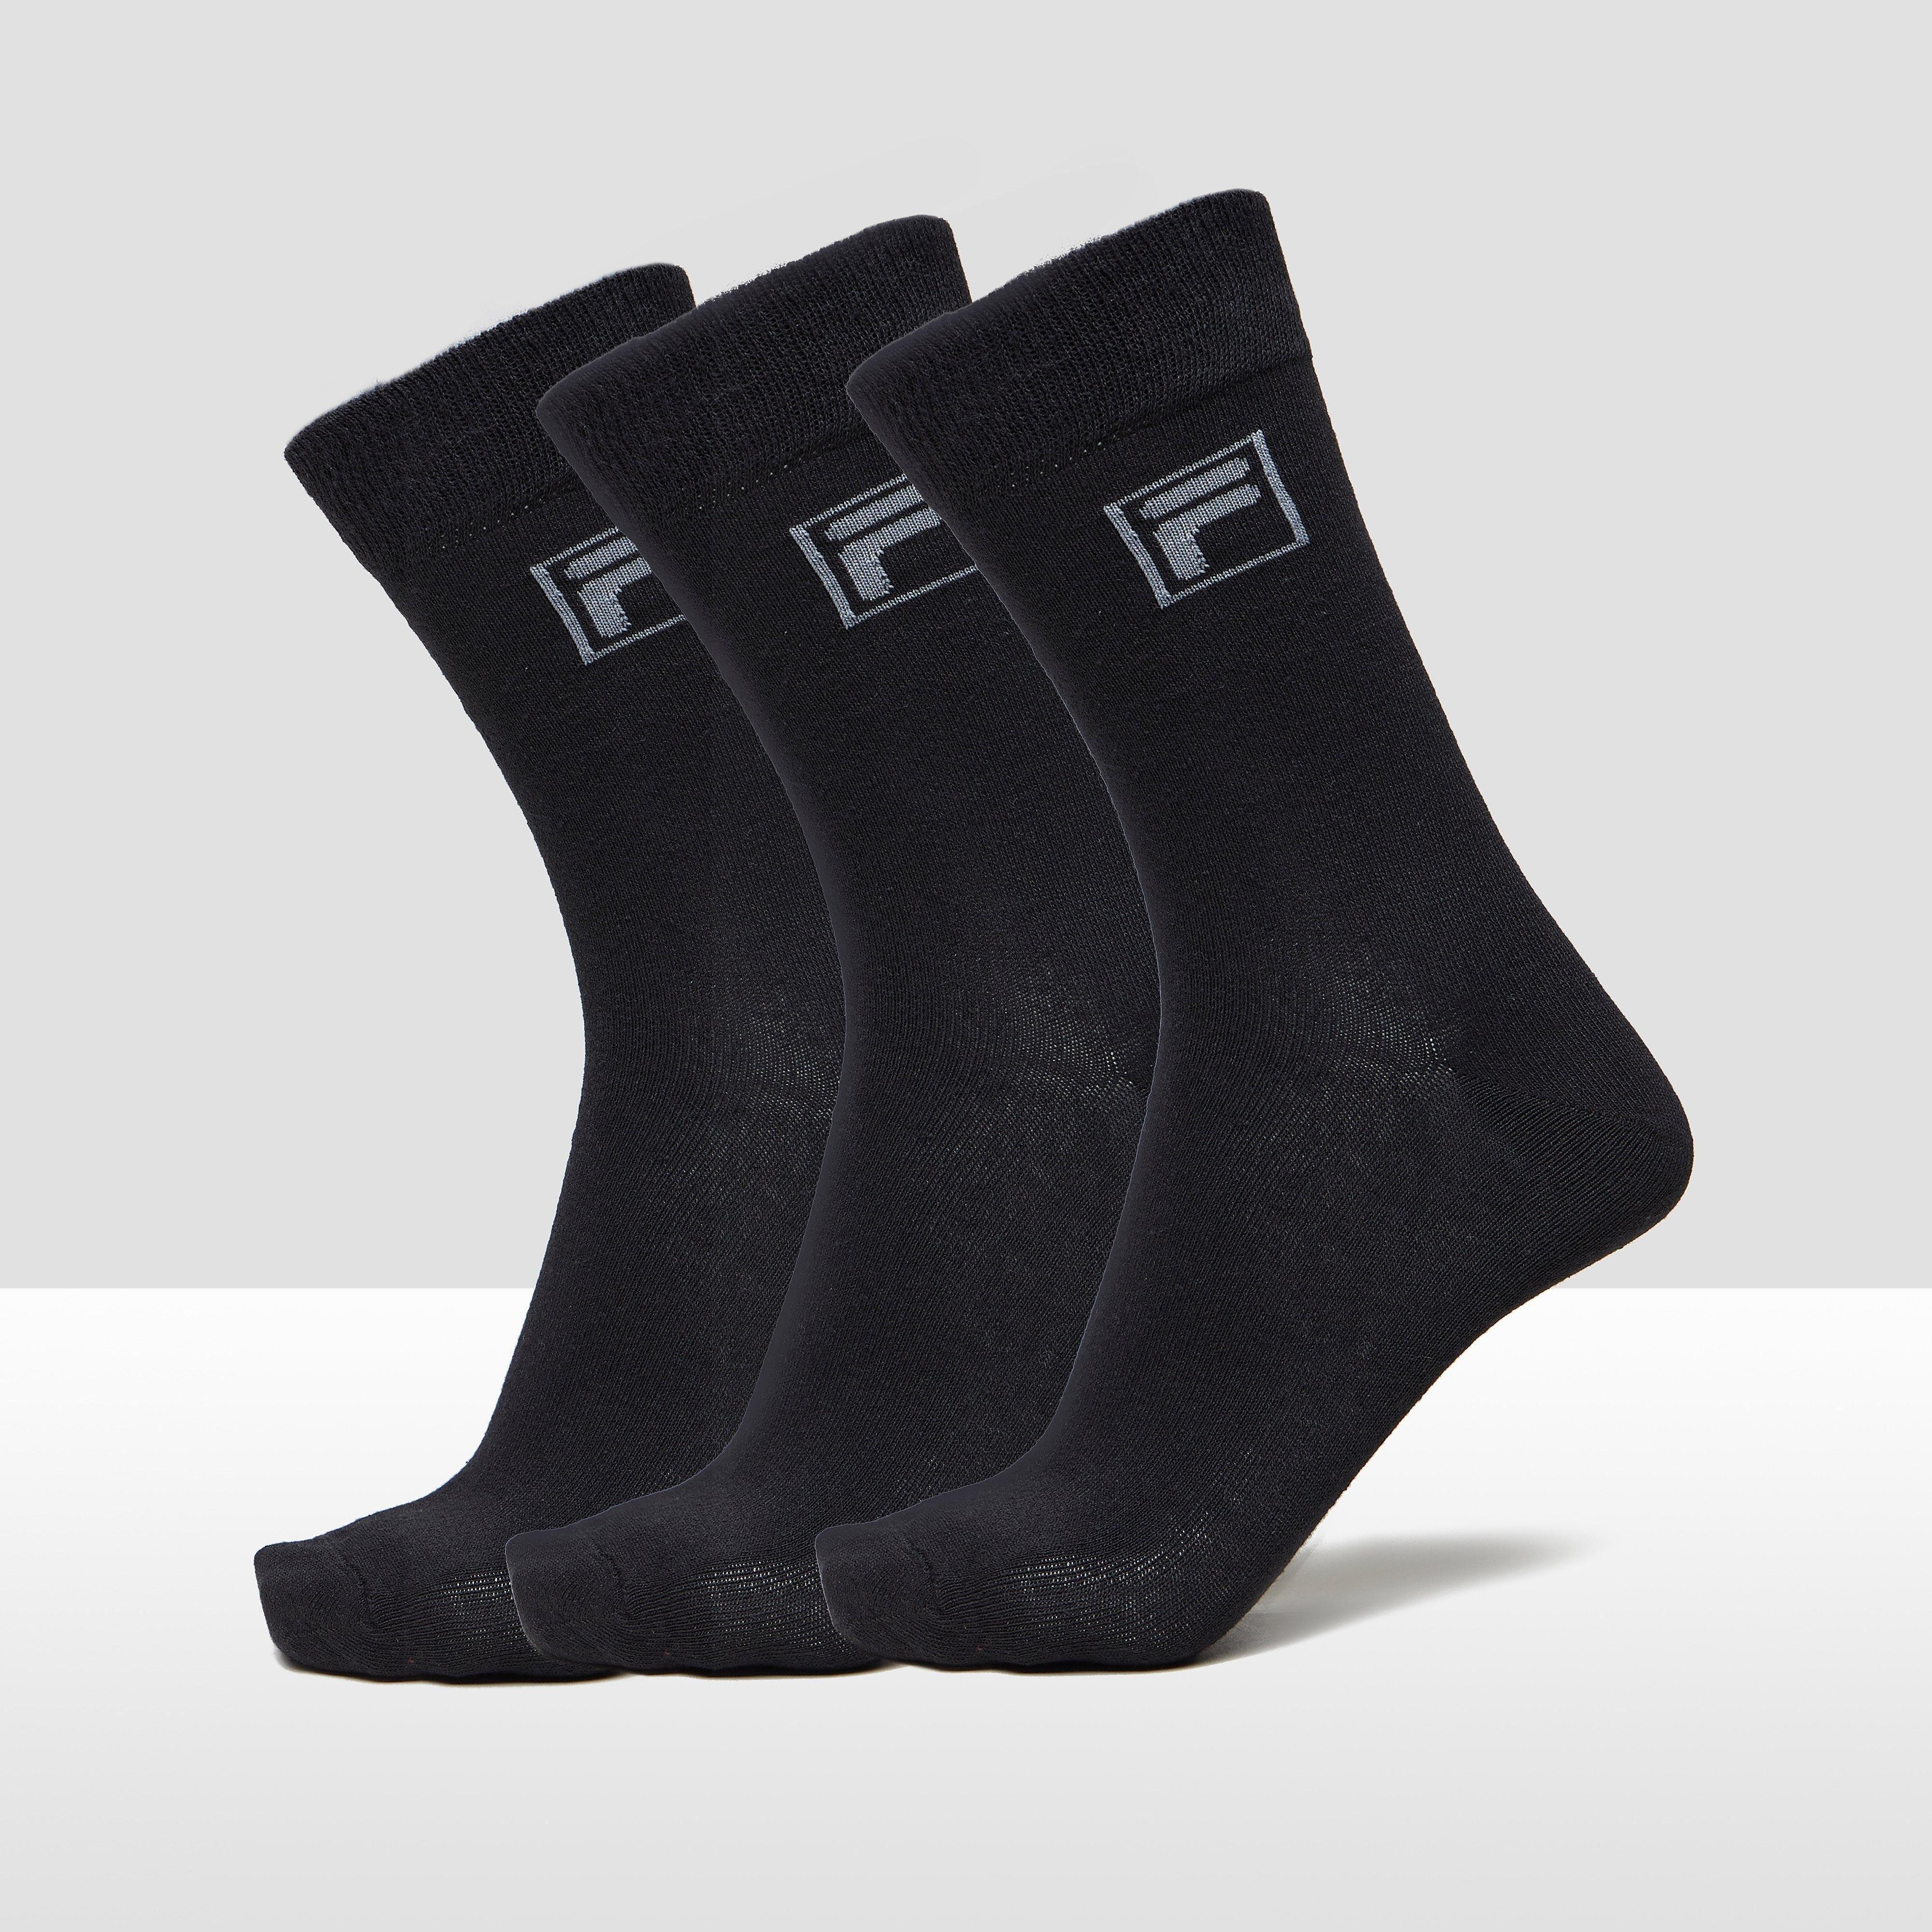 FILA ESS DRESSED SOKKEN 3-PACK BLAUW/ZWART